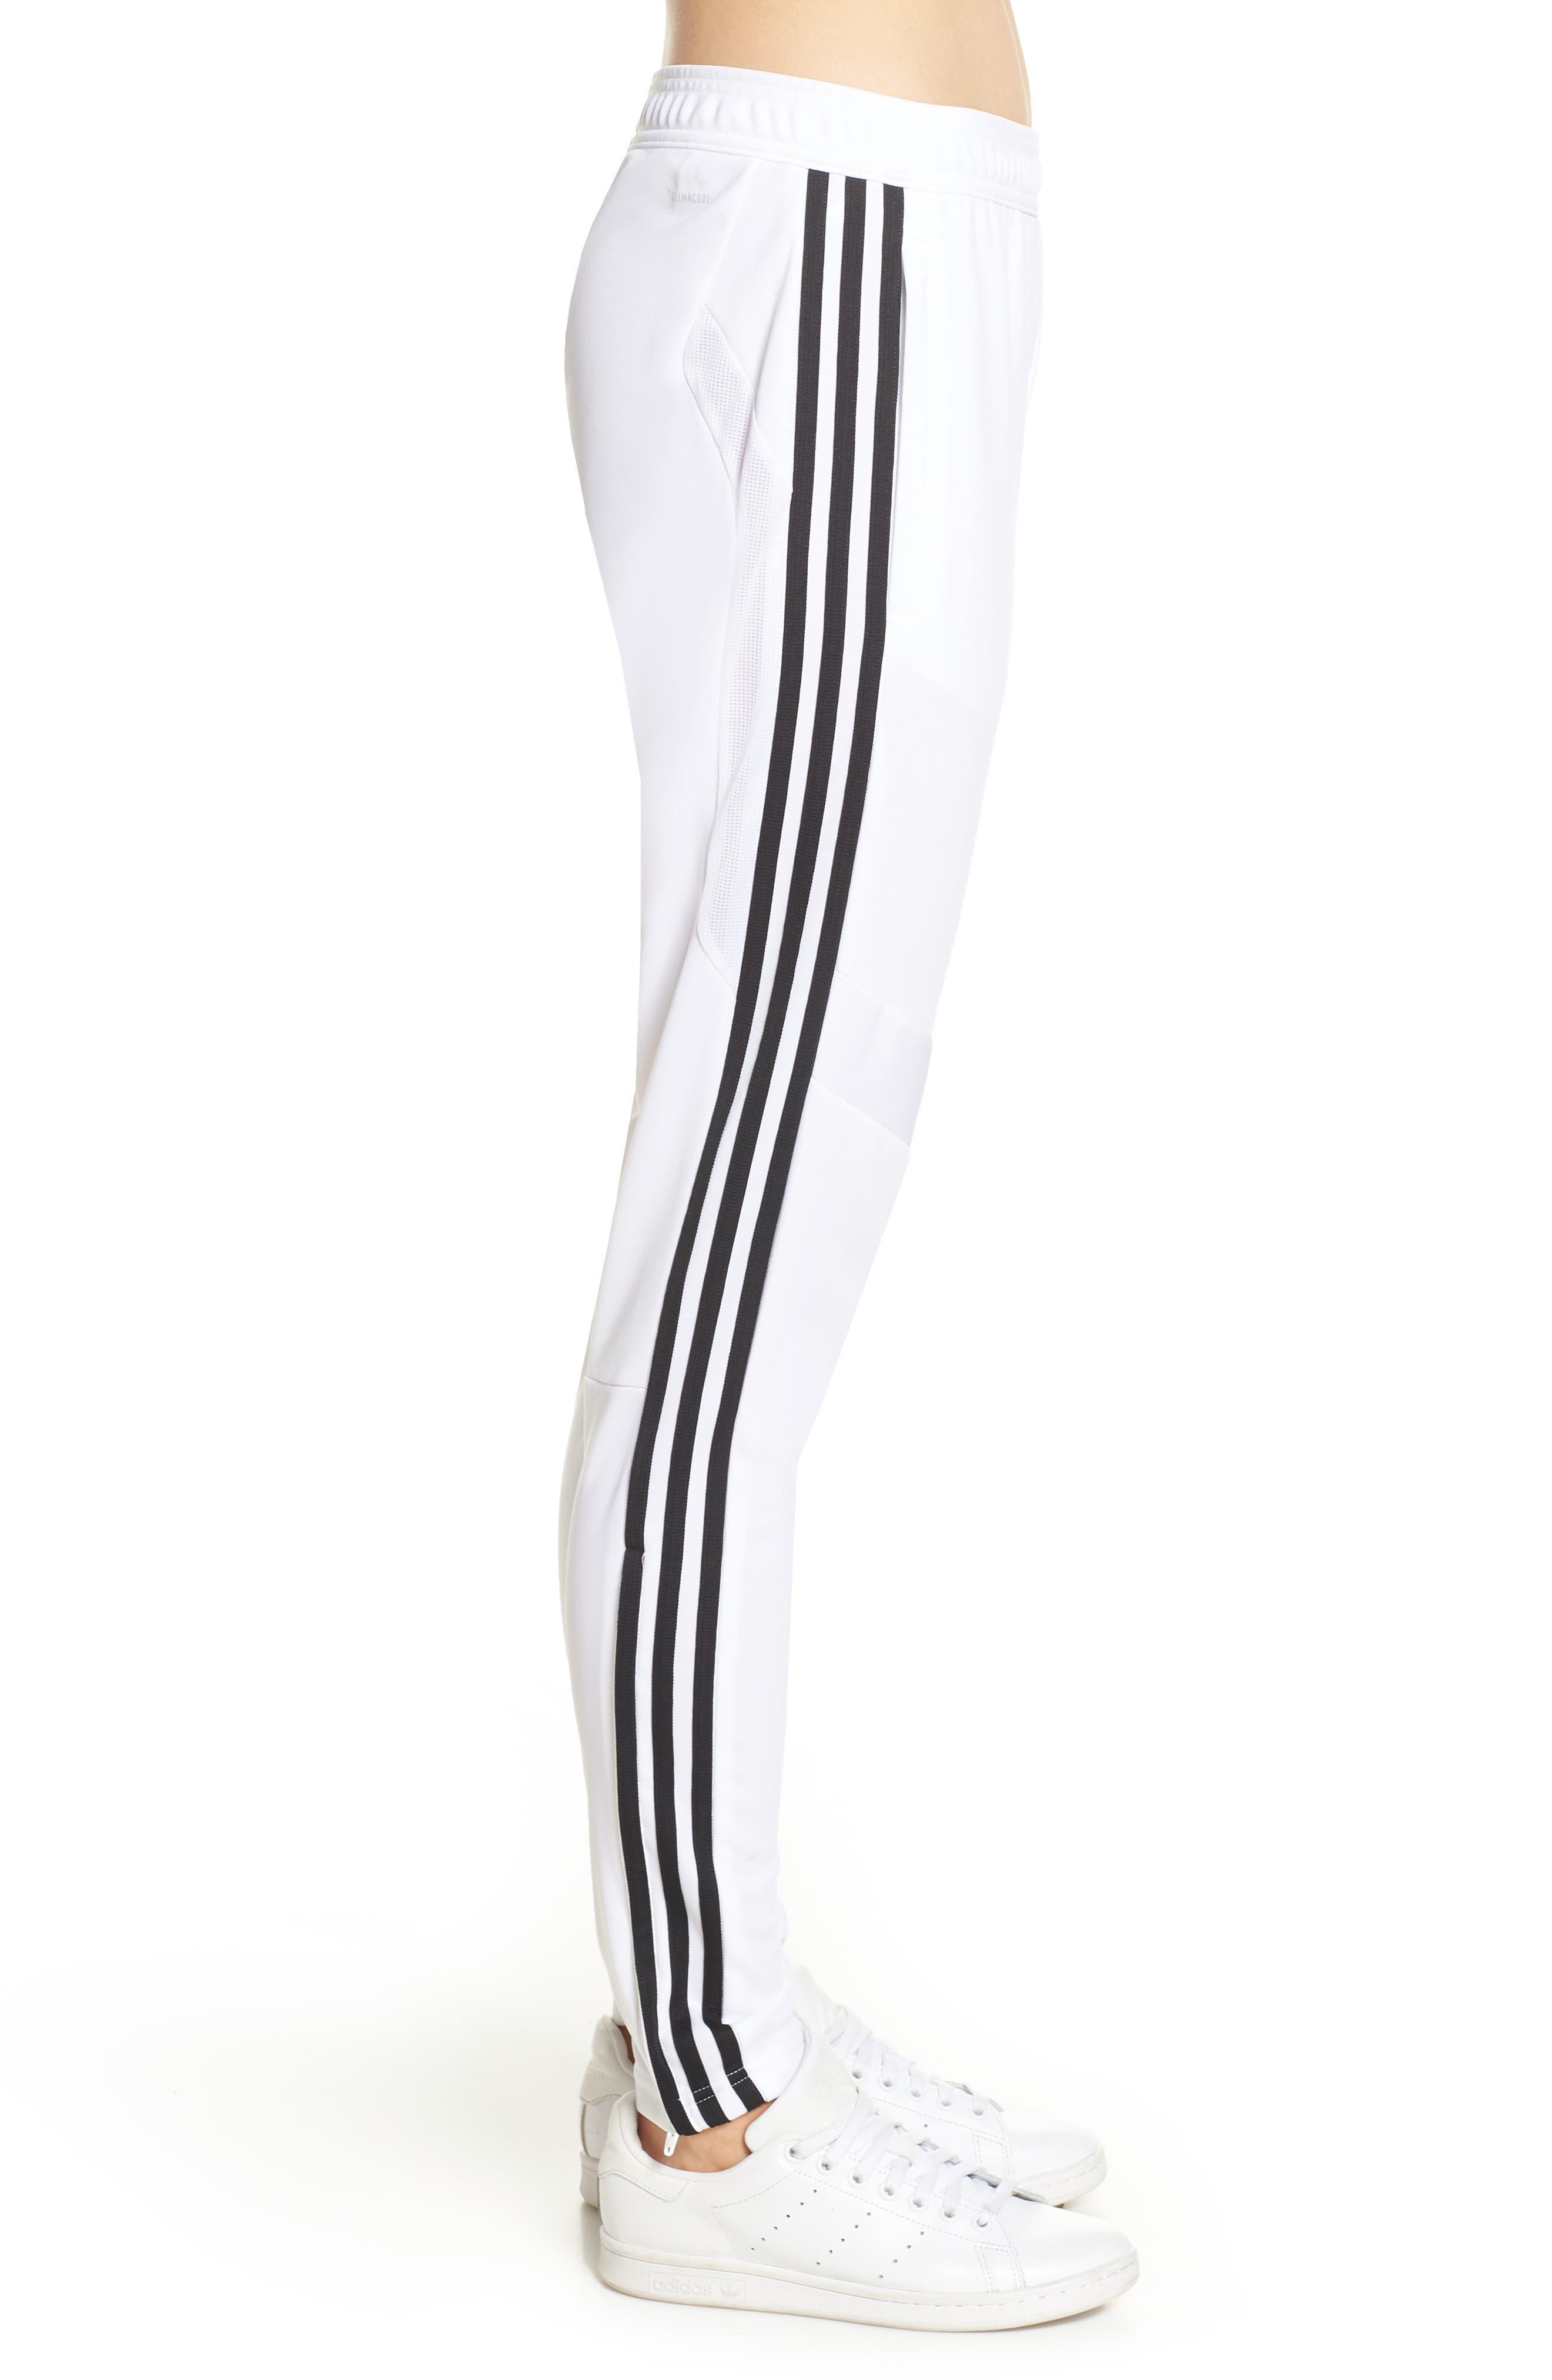 ADIDAS, Tiro 19 Training Pants, Alternate thumbnail 4, color, WHITE/ BLACK